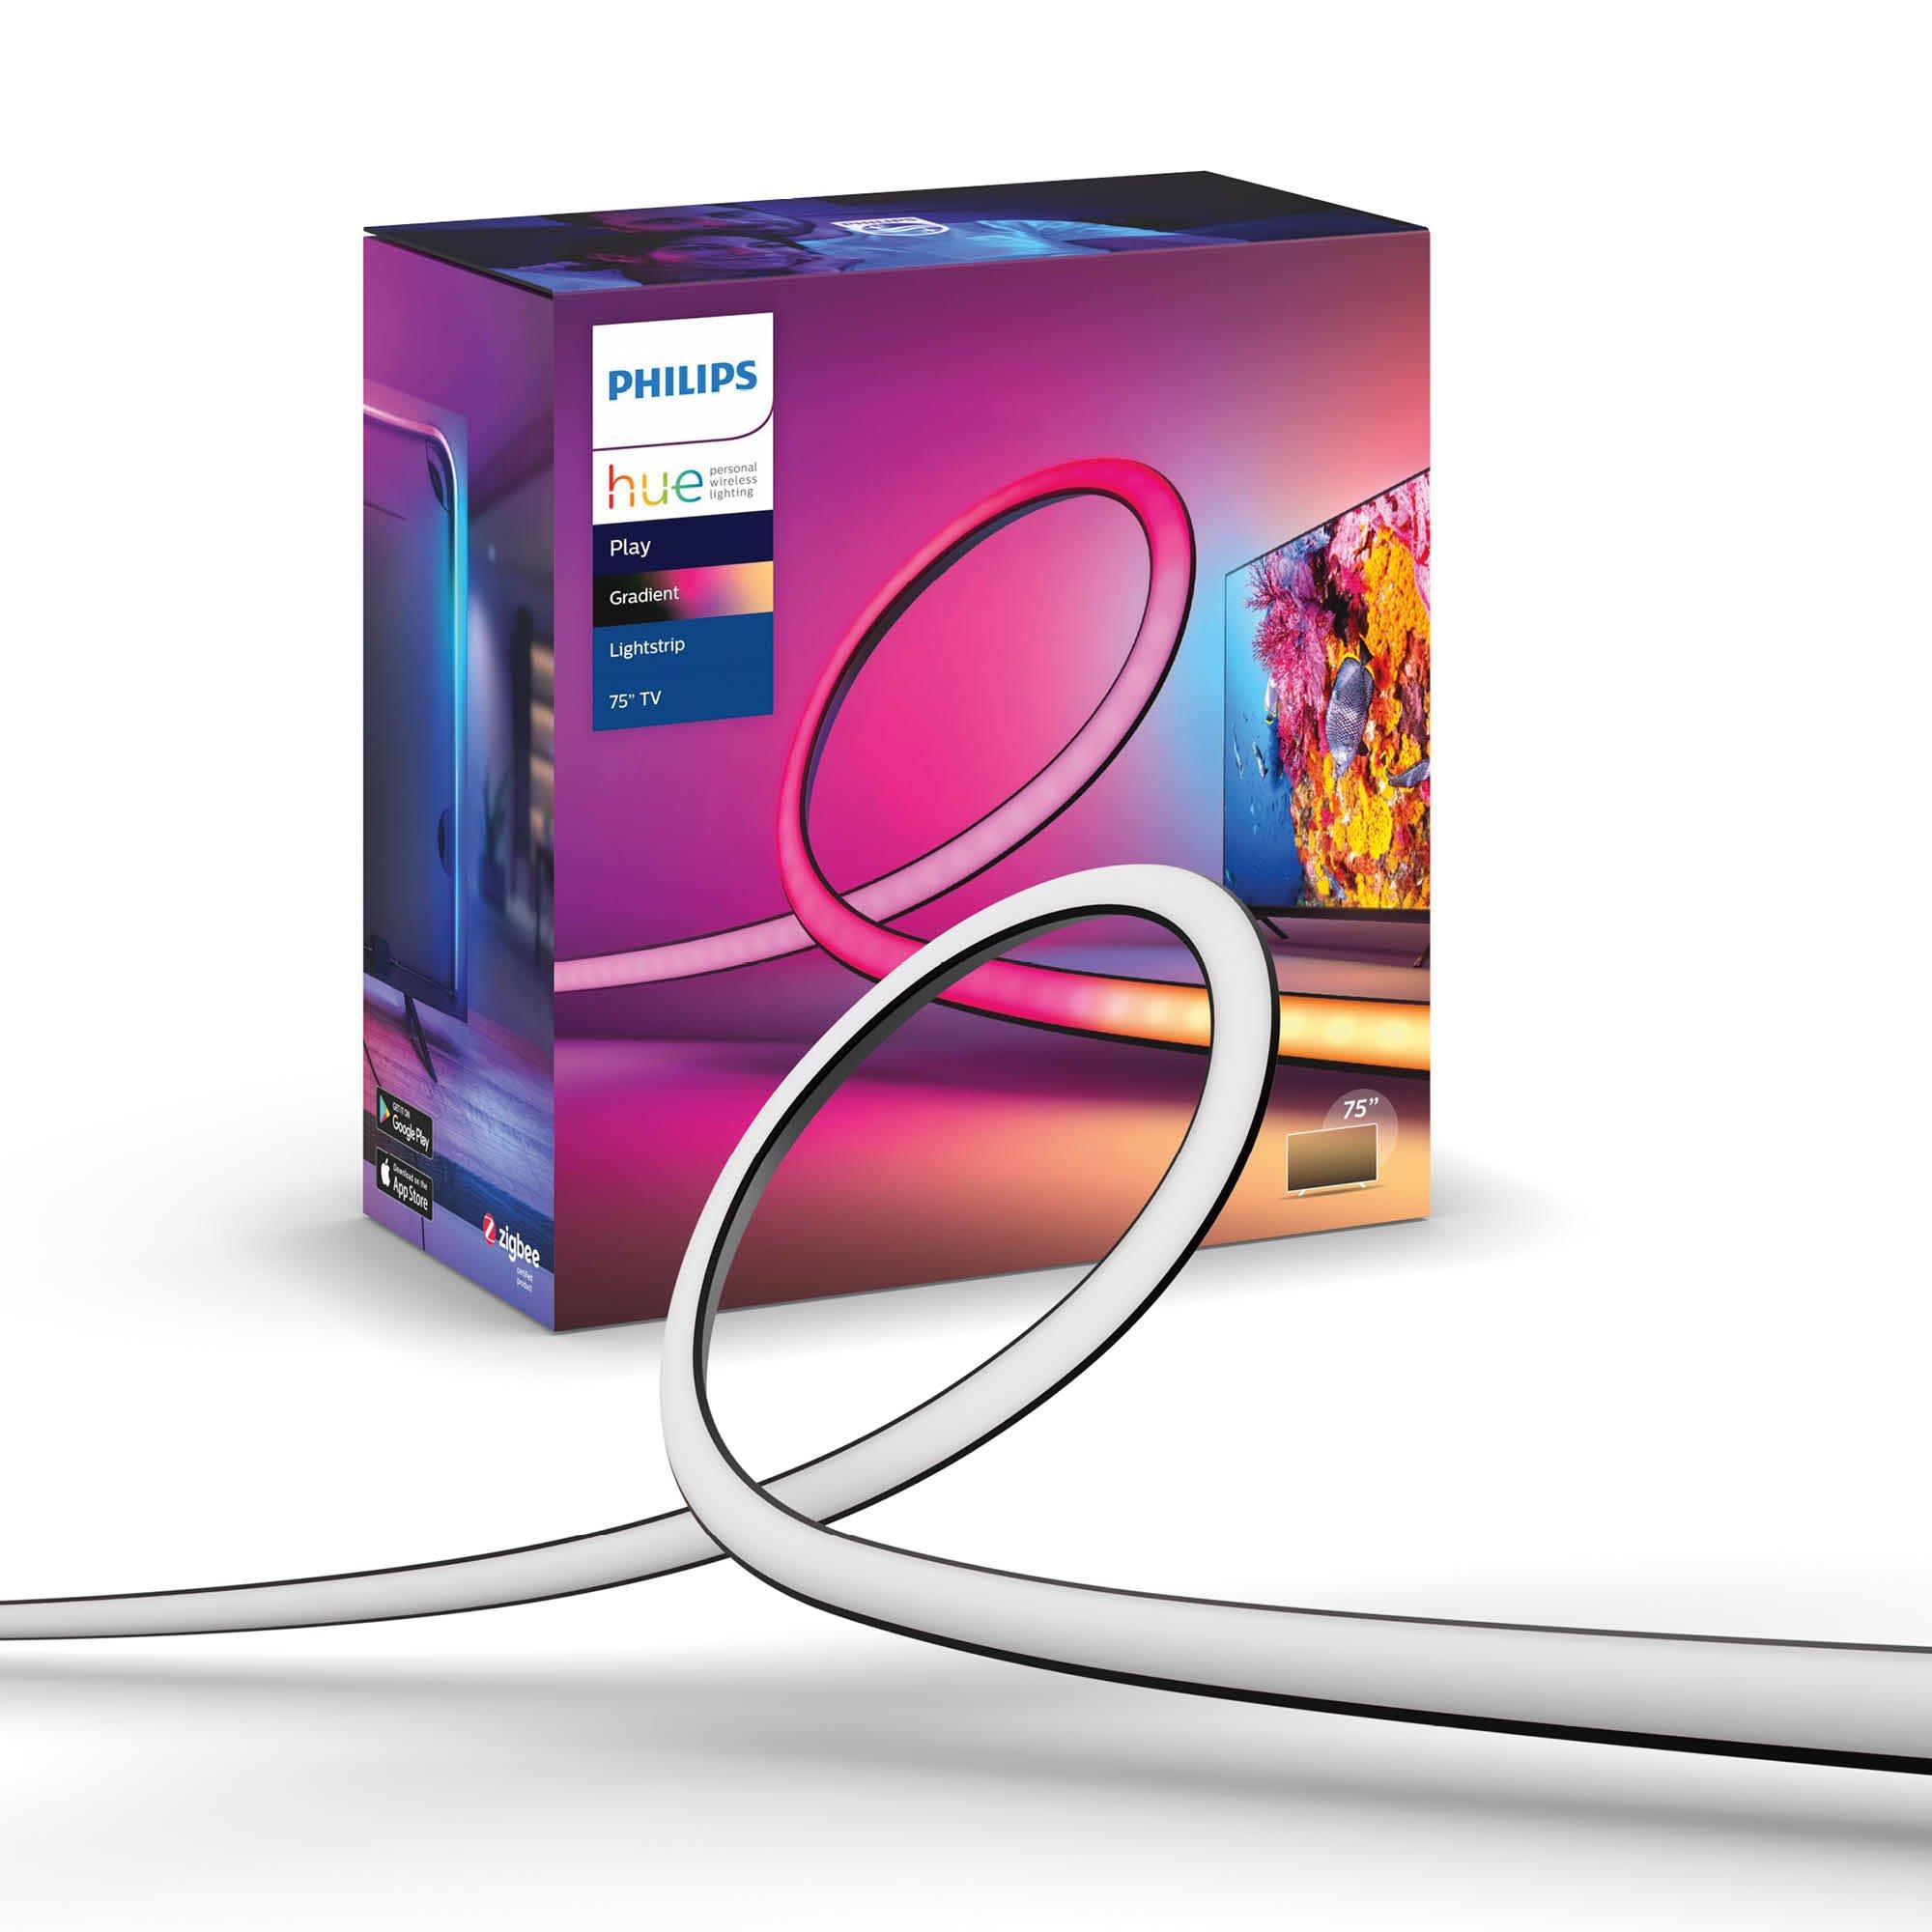 "Philips Hue - Lightstrip Gradient Lightstrip (for TV) TV 75"" EU Hue Sync Box Needed"